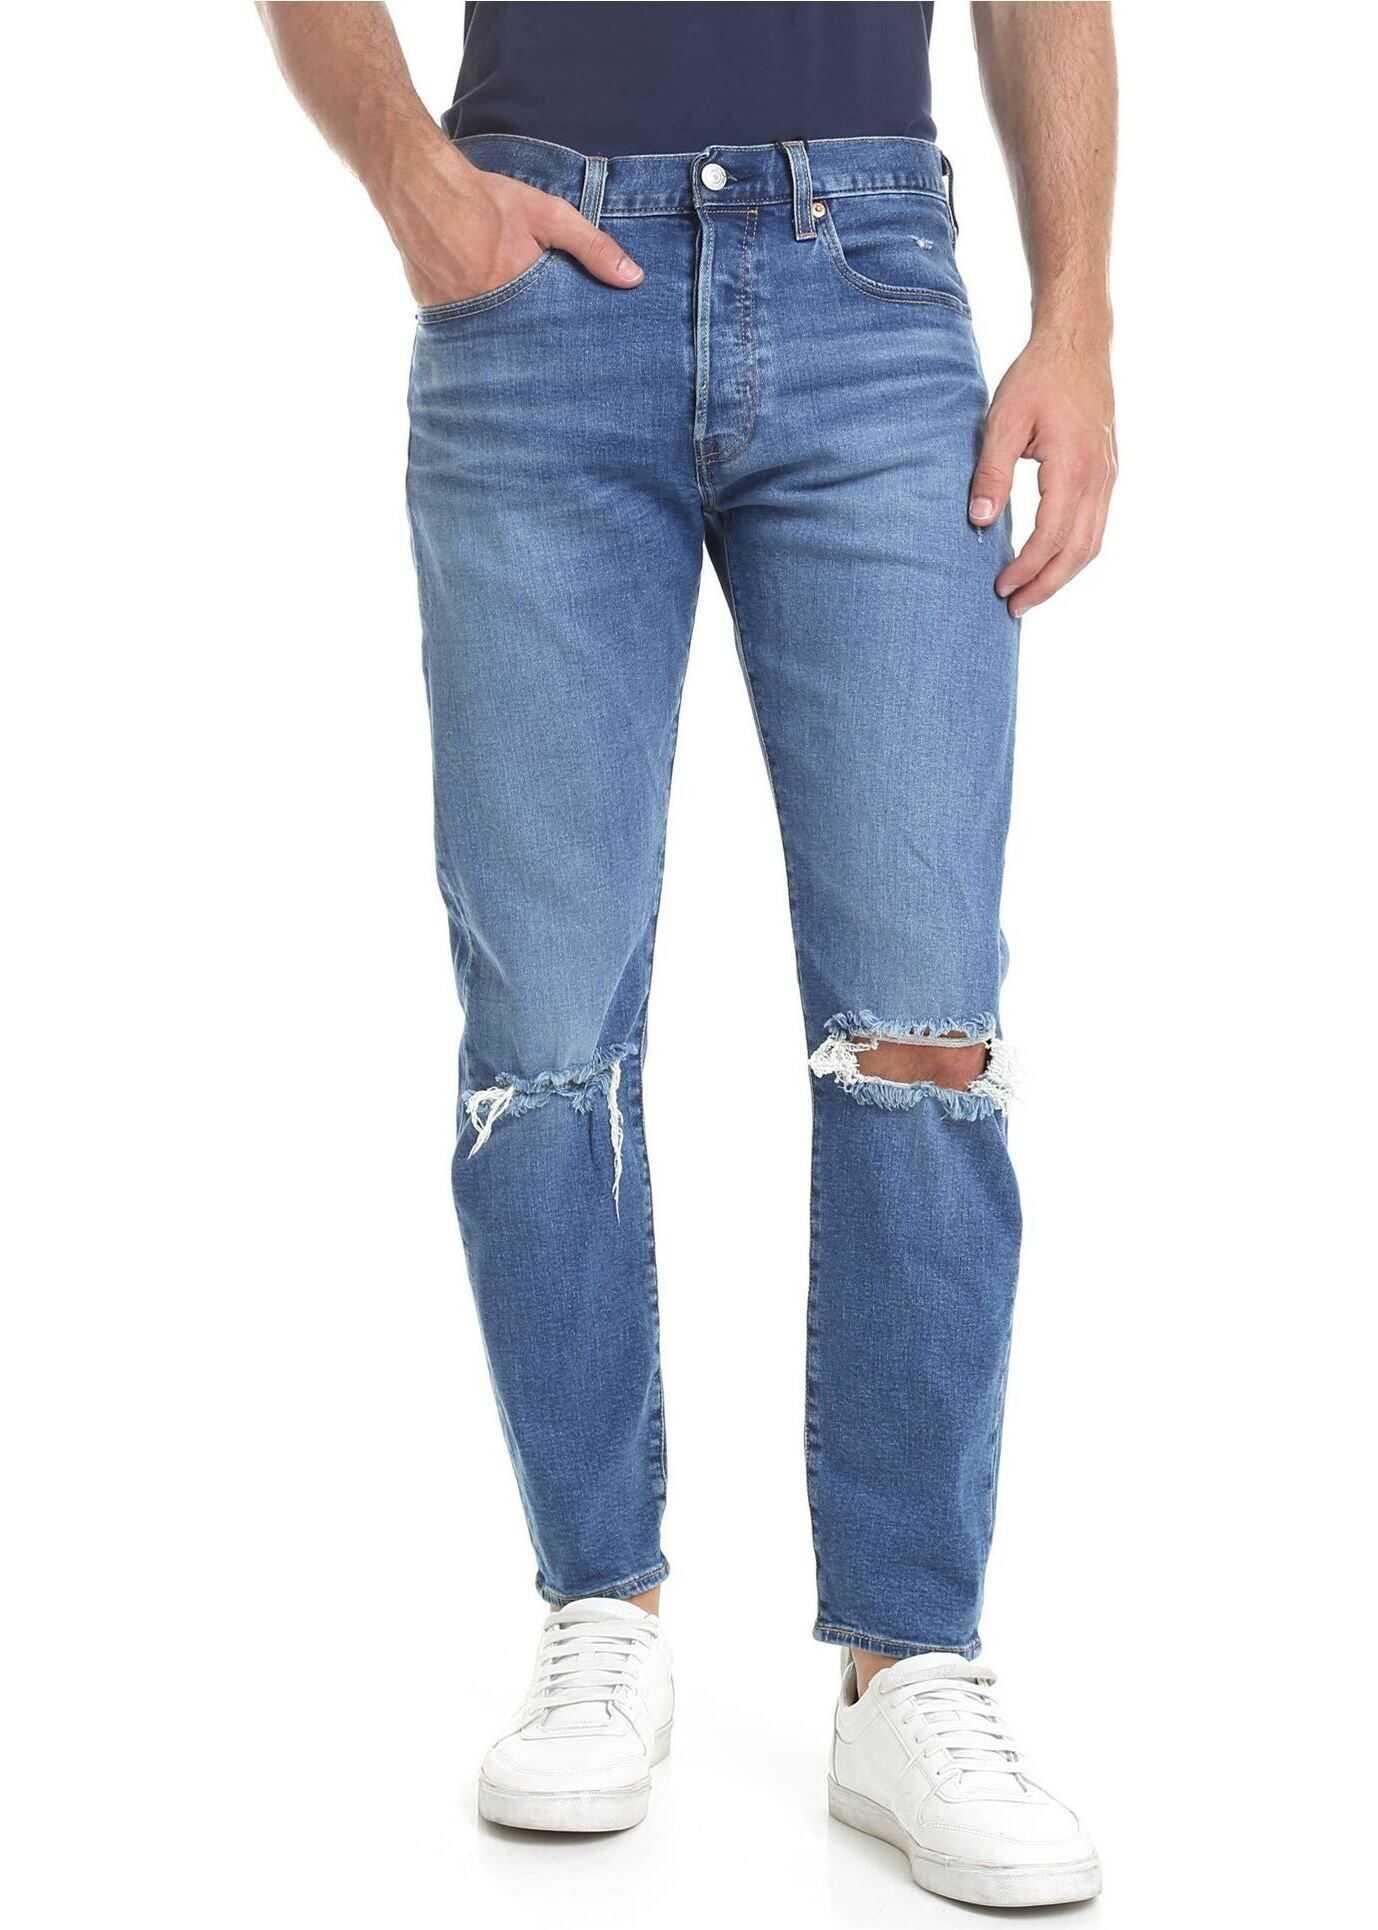 Levi's® 501 Slim Taper Jeans In Blue* Blue